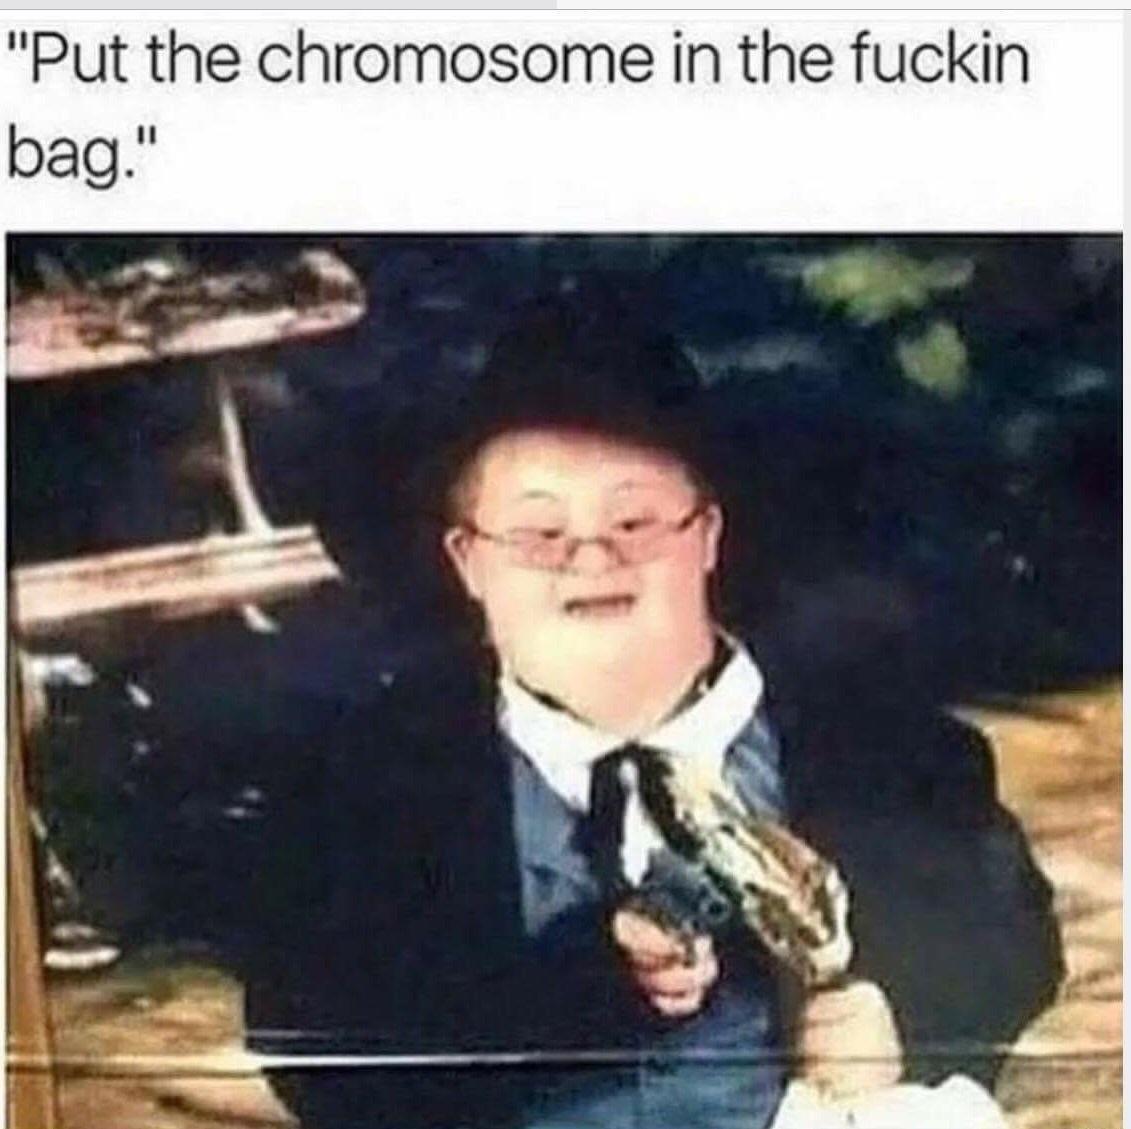 f1266310042b48fe9b22cdee7ca7acb4 put the chromosome in the fucking bag the tasteless gentlemen